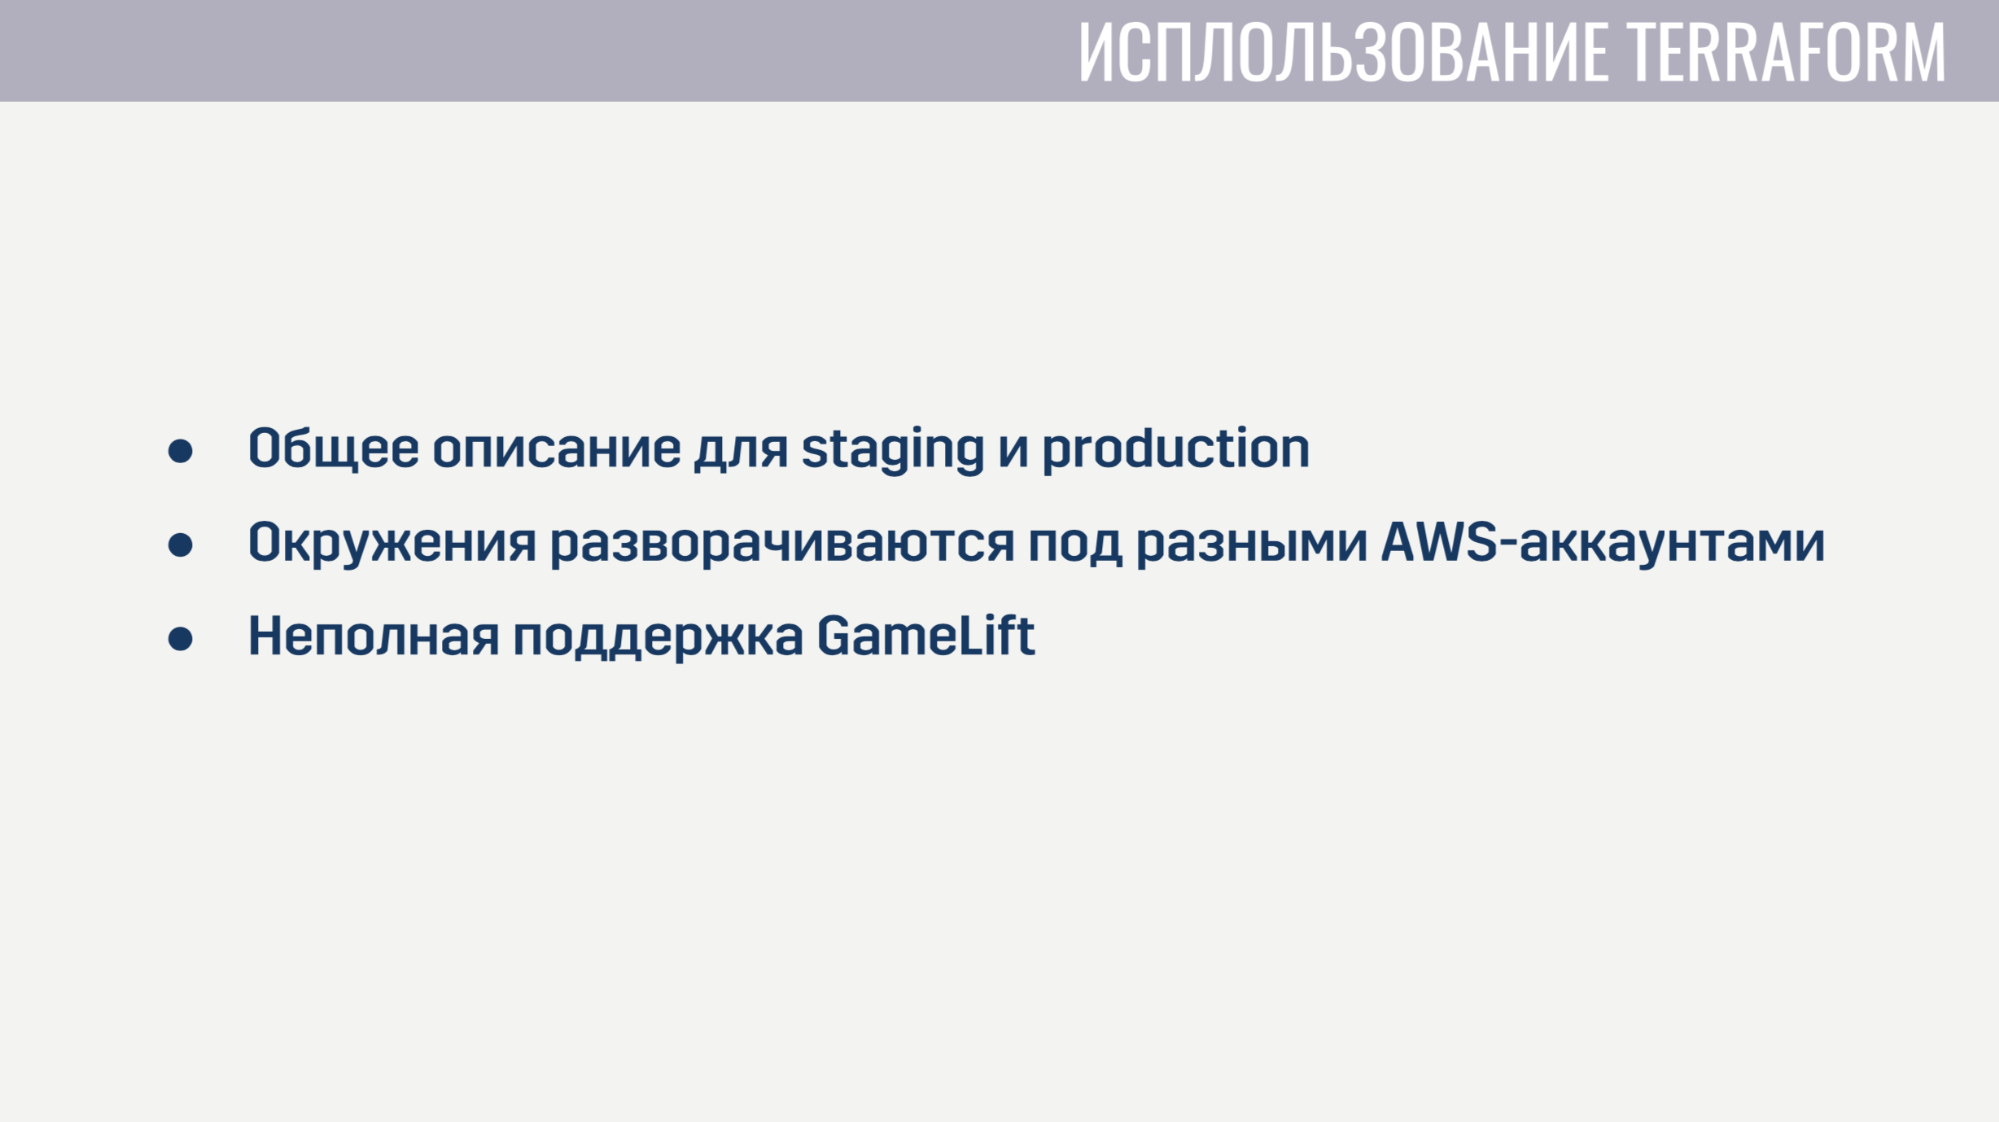 Архитектура мета-сервера мобильного онлайн-шутера Tacticool - 15